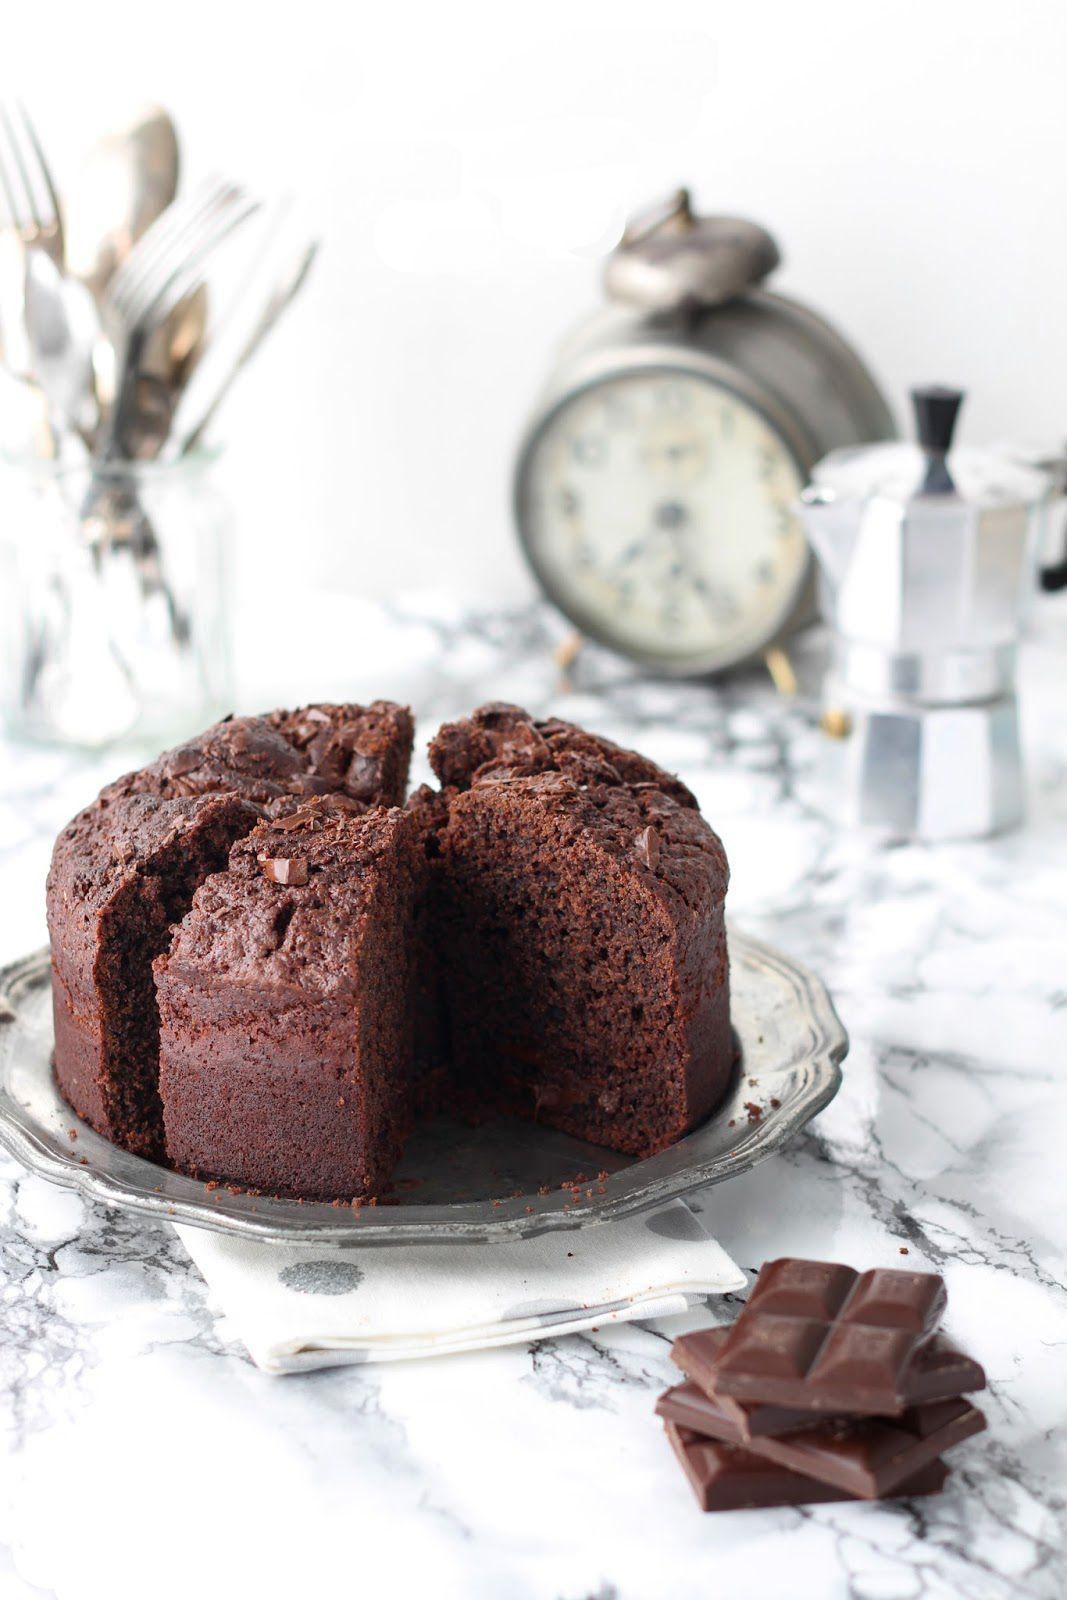 Easy No-egg Chocolate Cake Recipe | Bakery cakes, Sweet ...